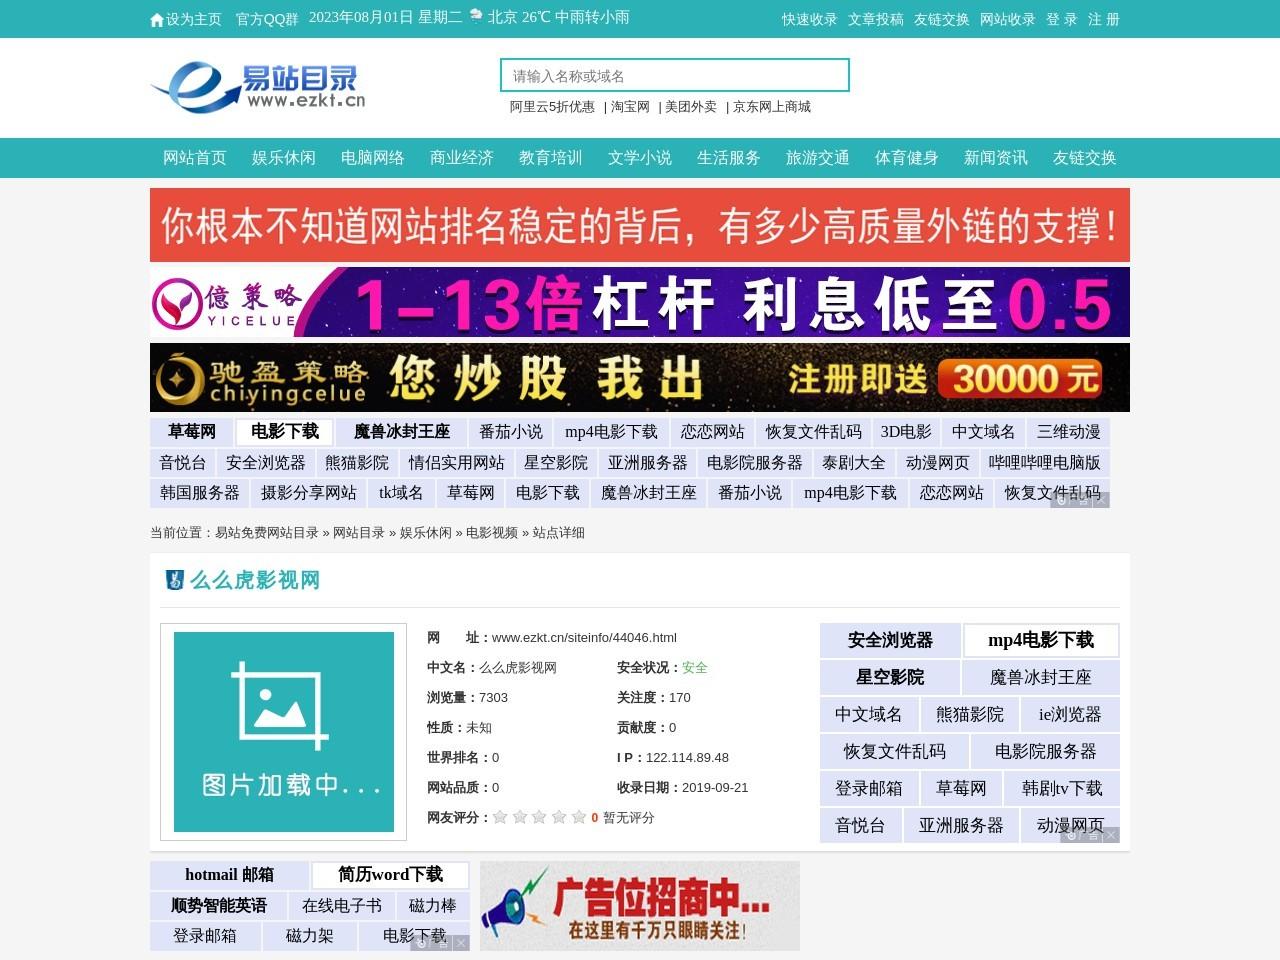 么么虎影视网_www.ezkt.cn/siteinfo/44046.html